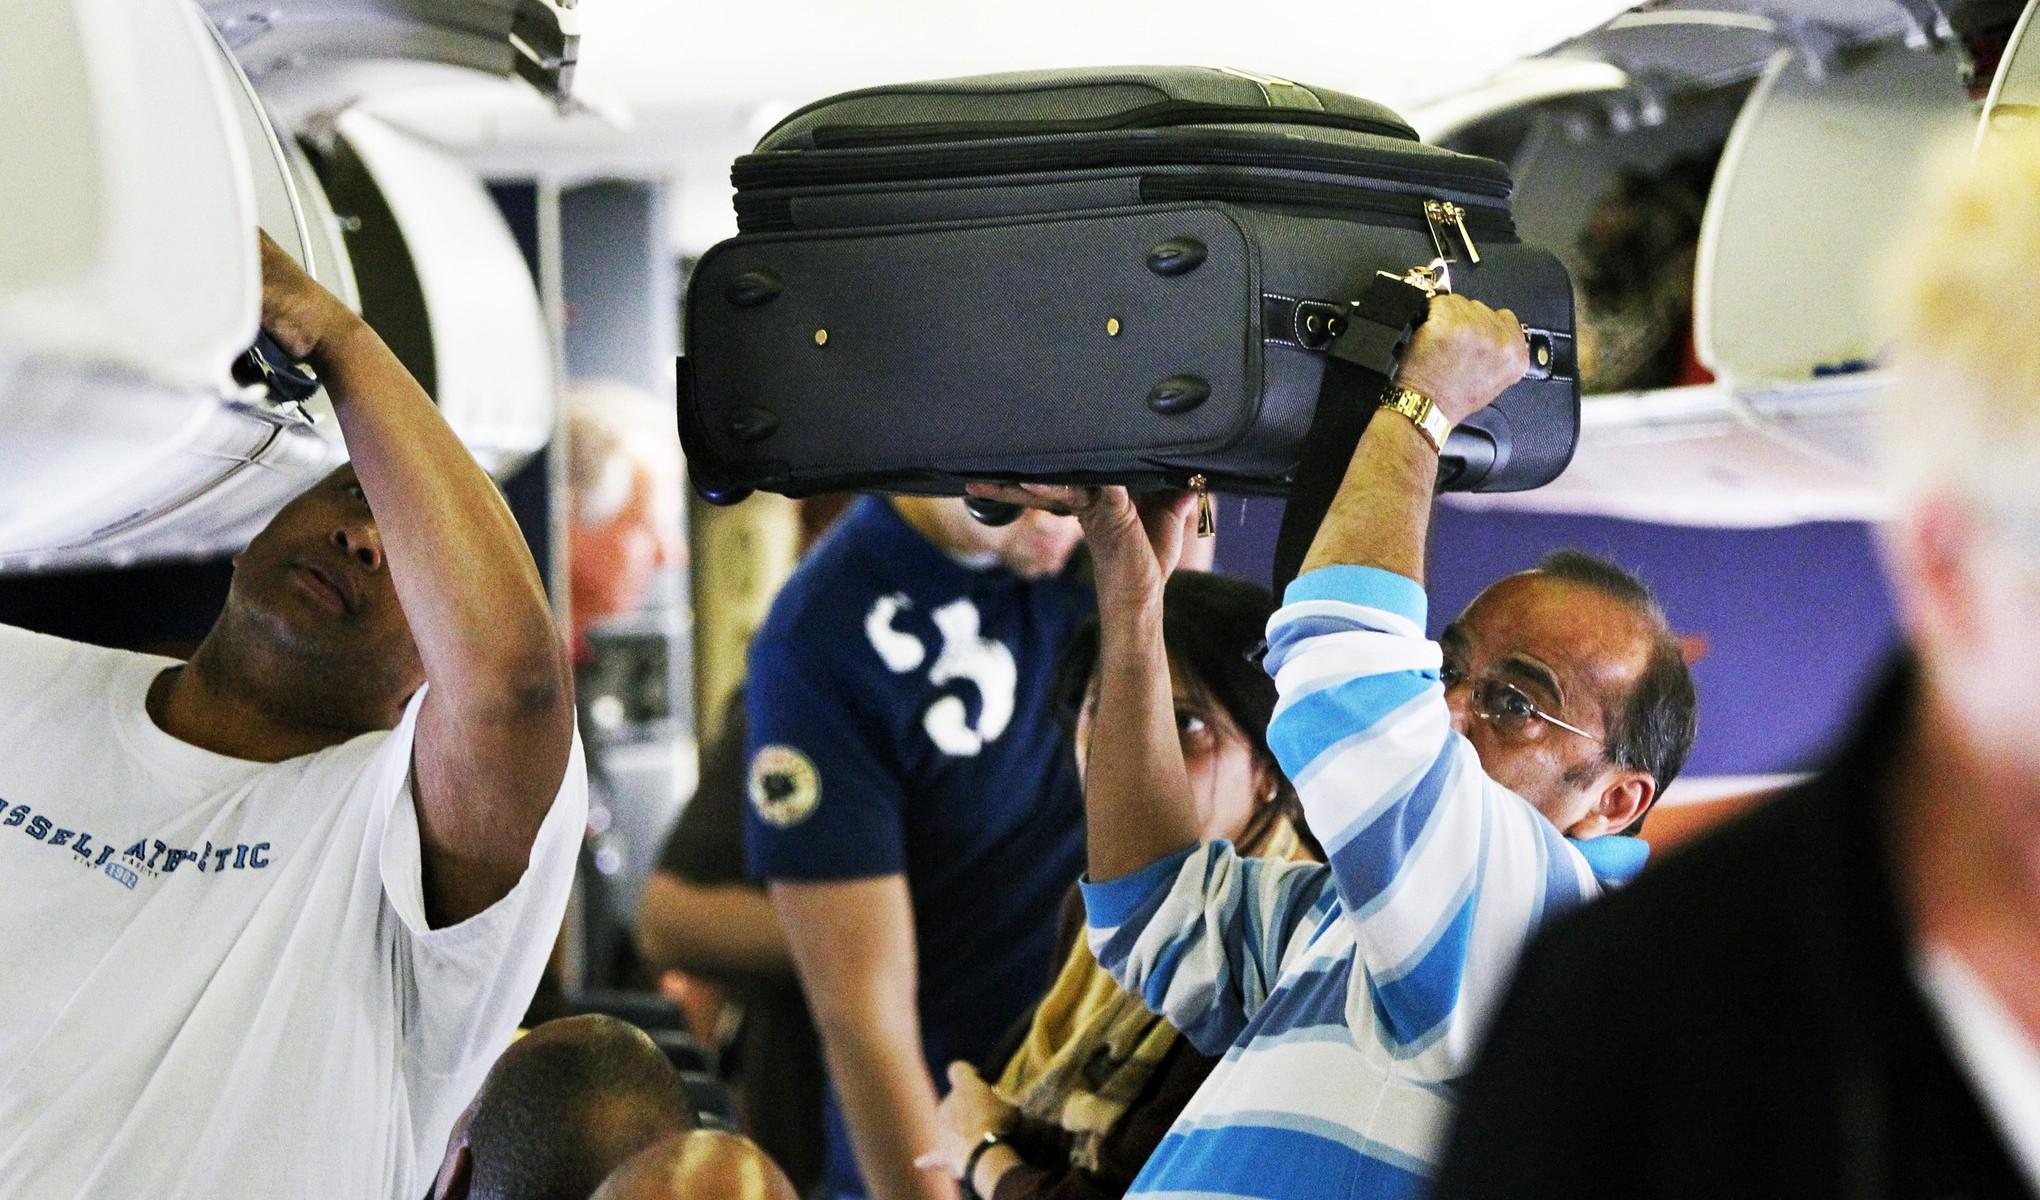 kesalahan budget traveler bagasi